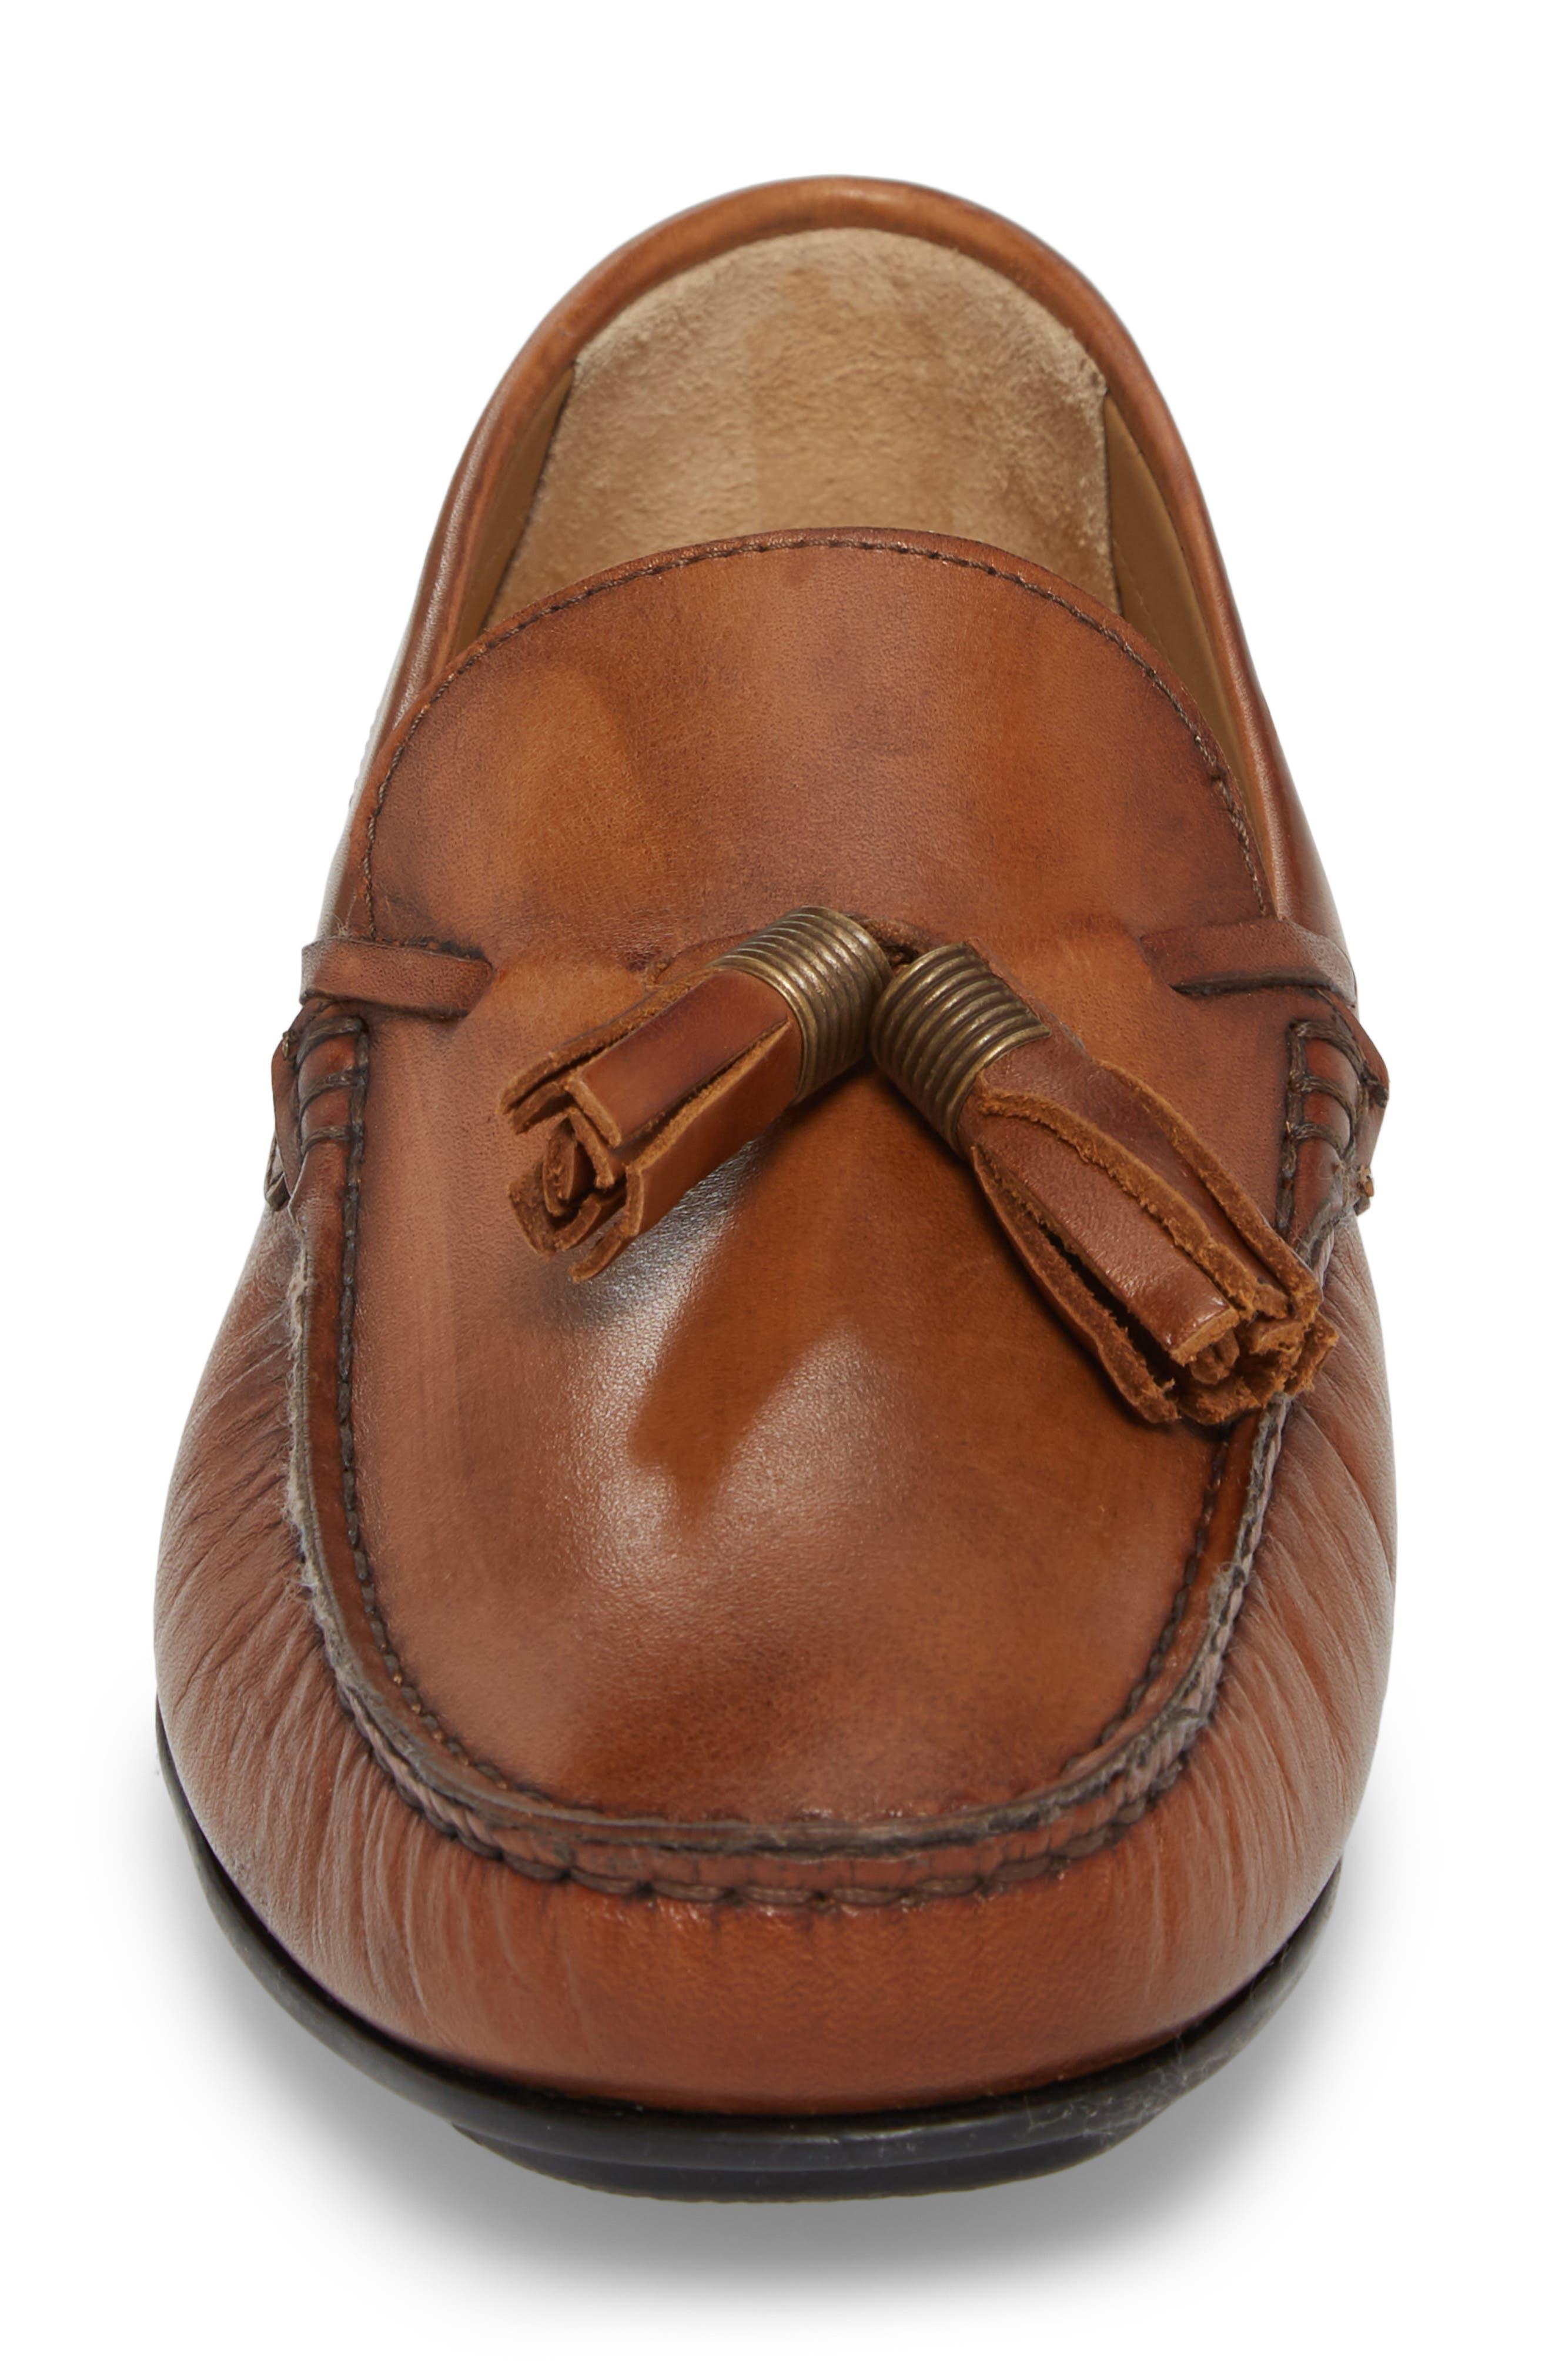 Randall Tassel Driving Moccasin,                             Alternate thumbnail 4, color,                             Cognac Leather